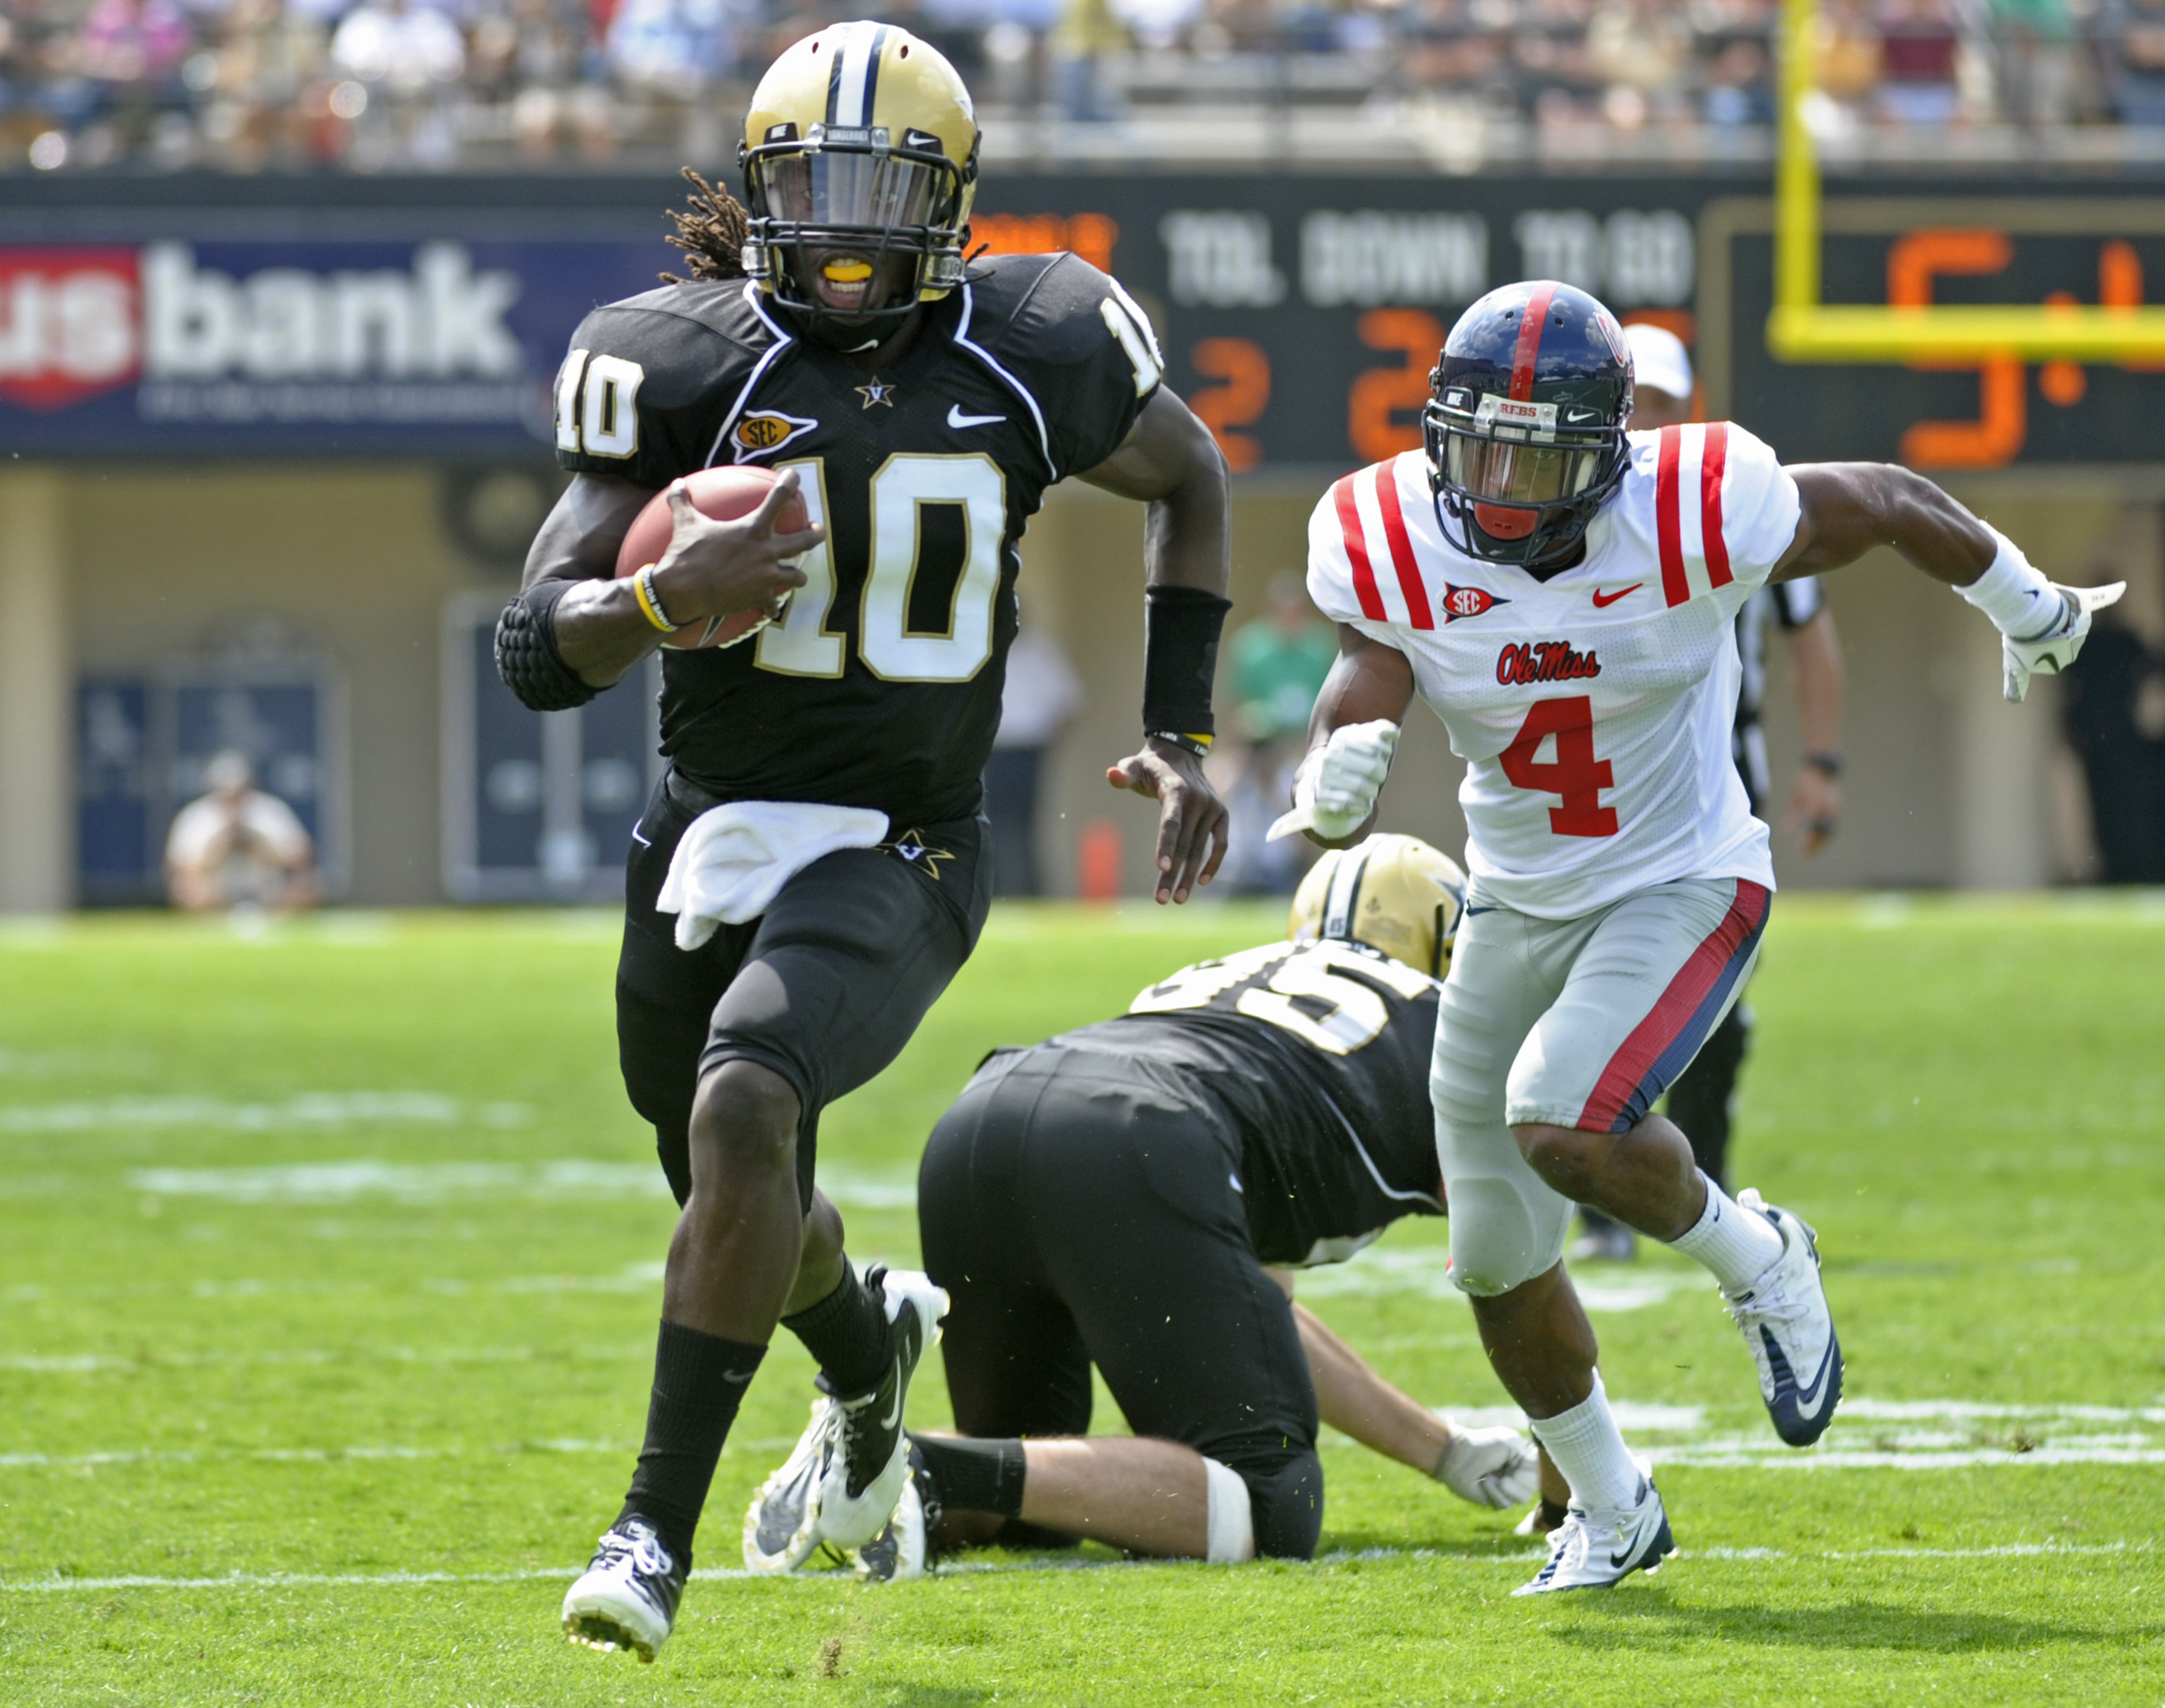 Vanderbilt commodores: 5 players to watch in 2015